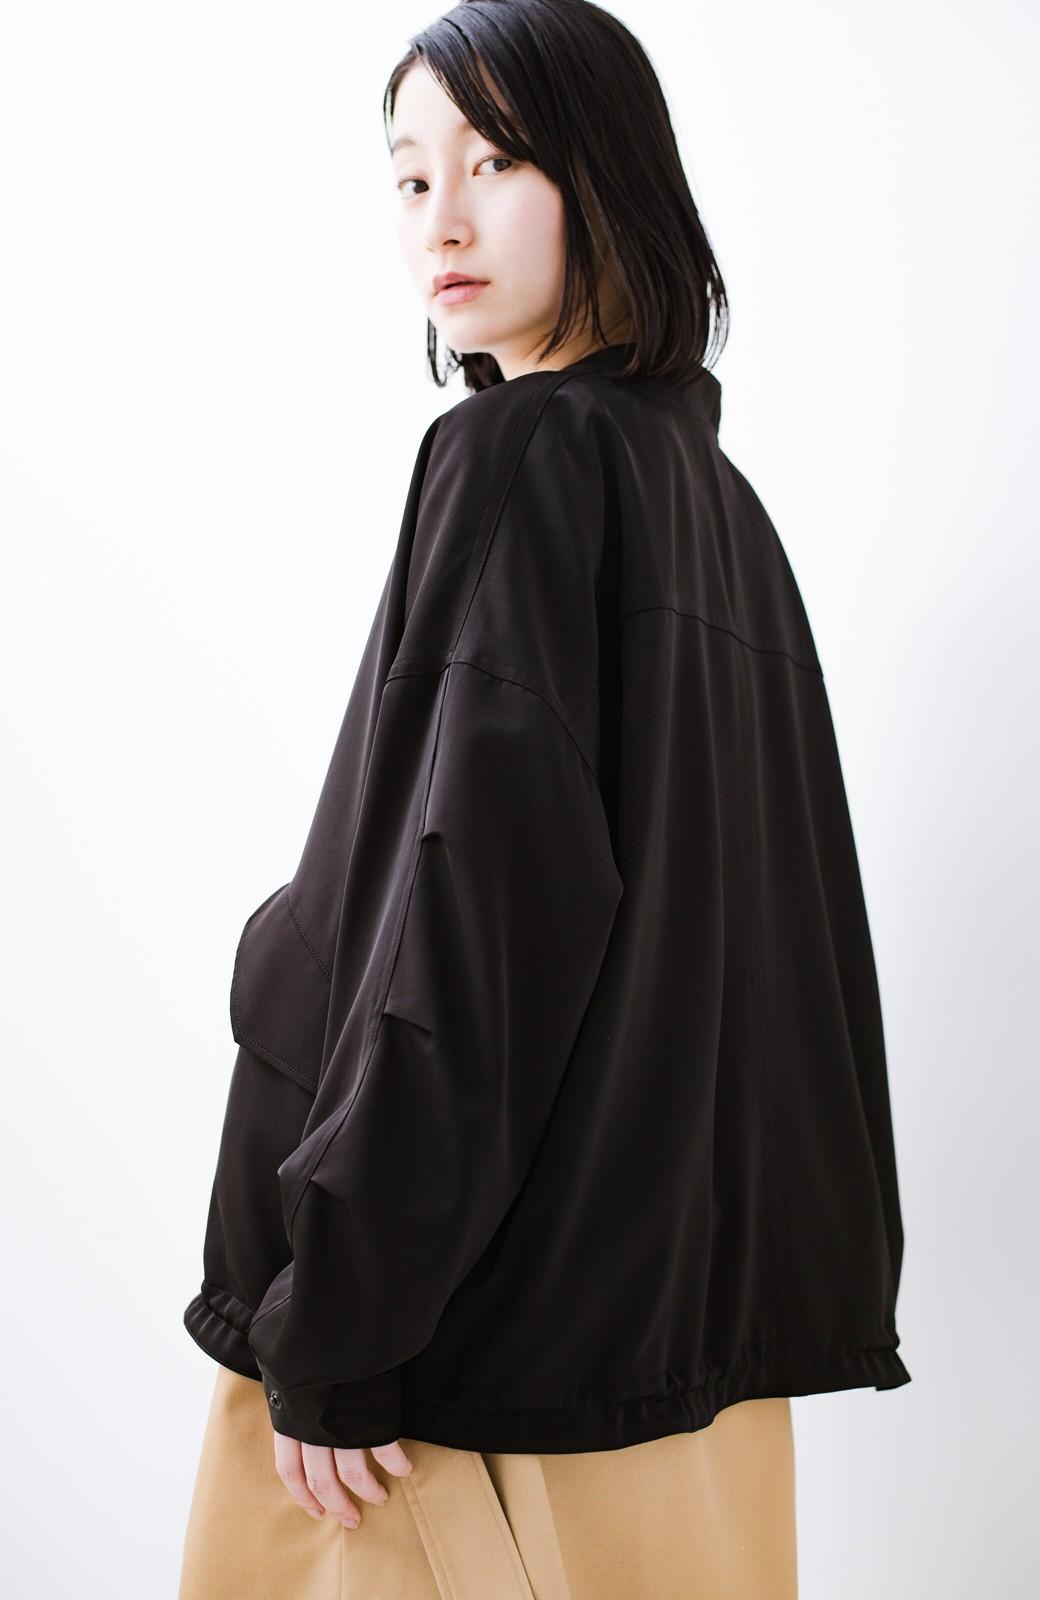 haco! 気軽に羽織ってかっこよくキマるオトナっぽブルゾンbyMAKORI <ブラック>の商品写真21